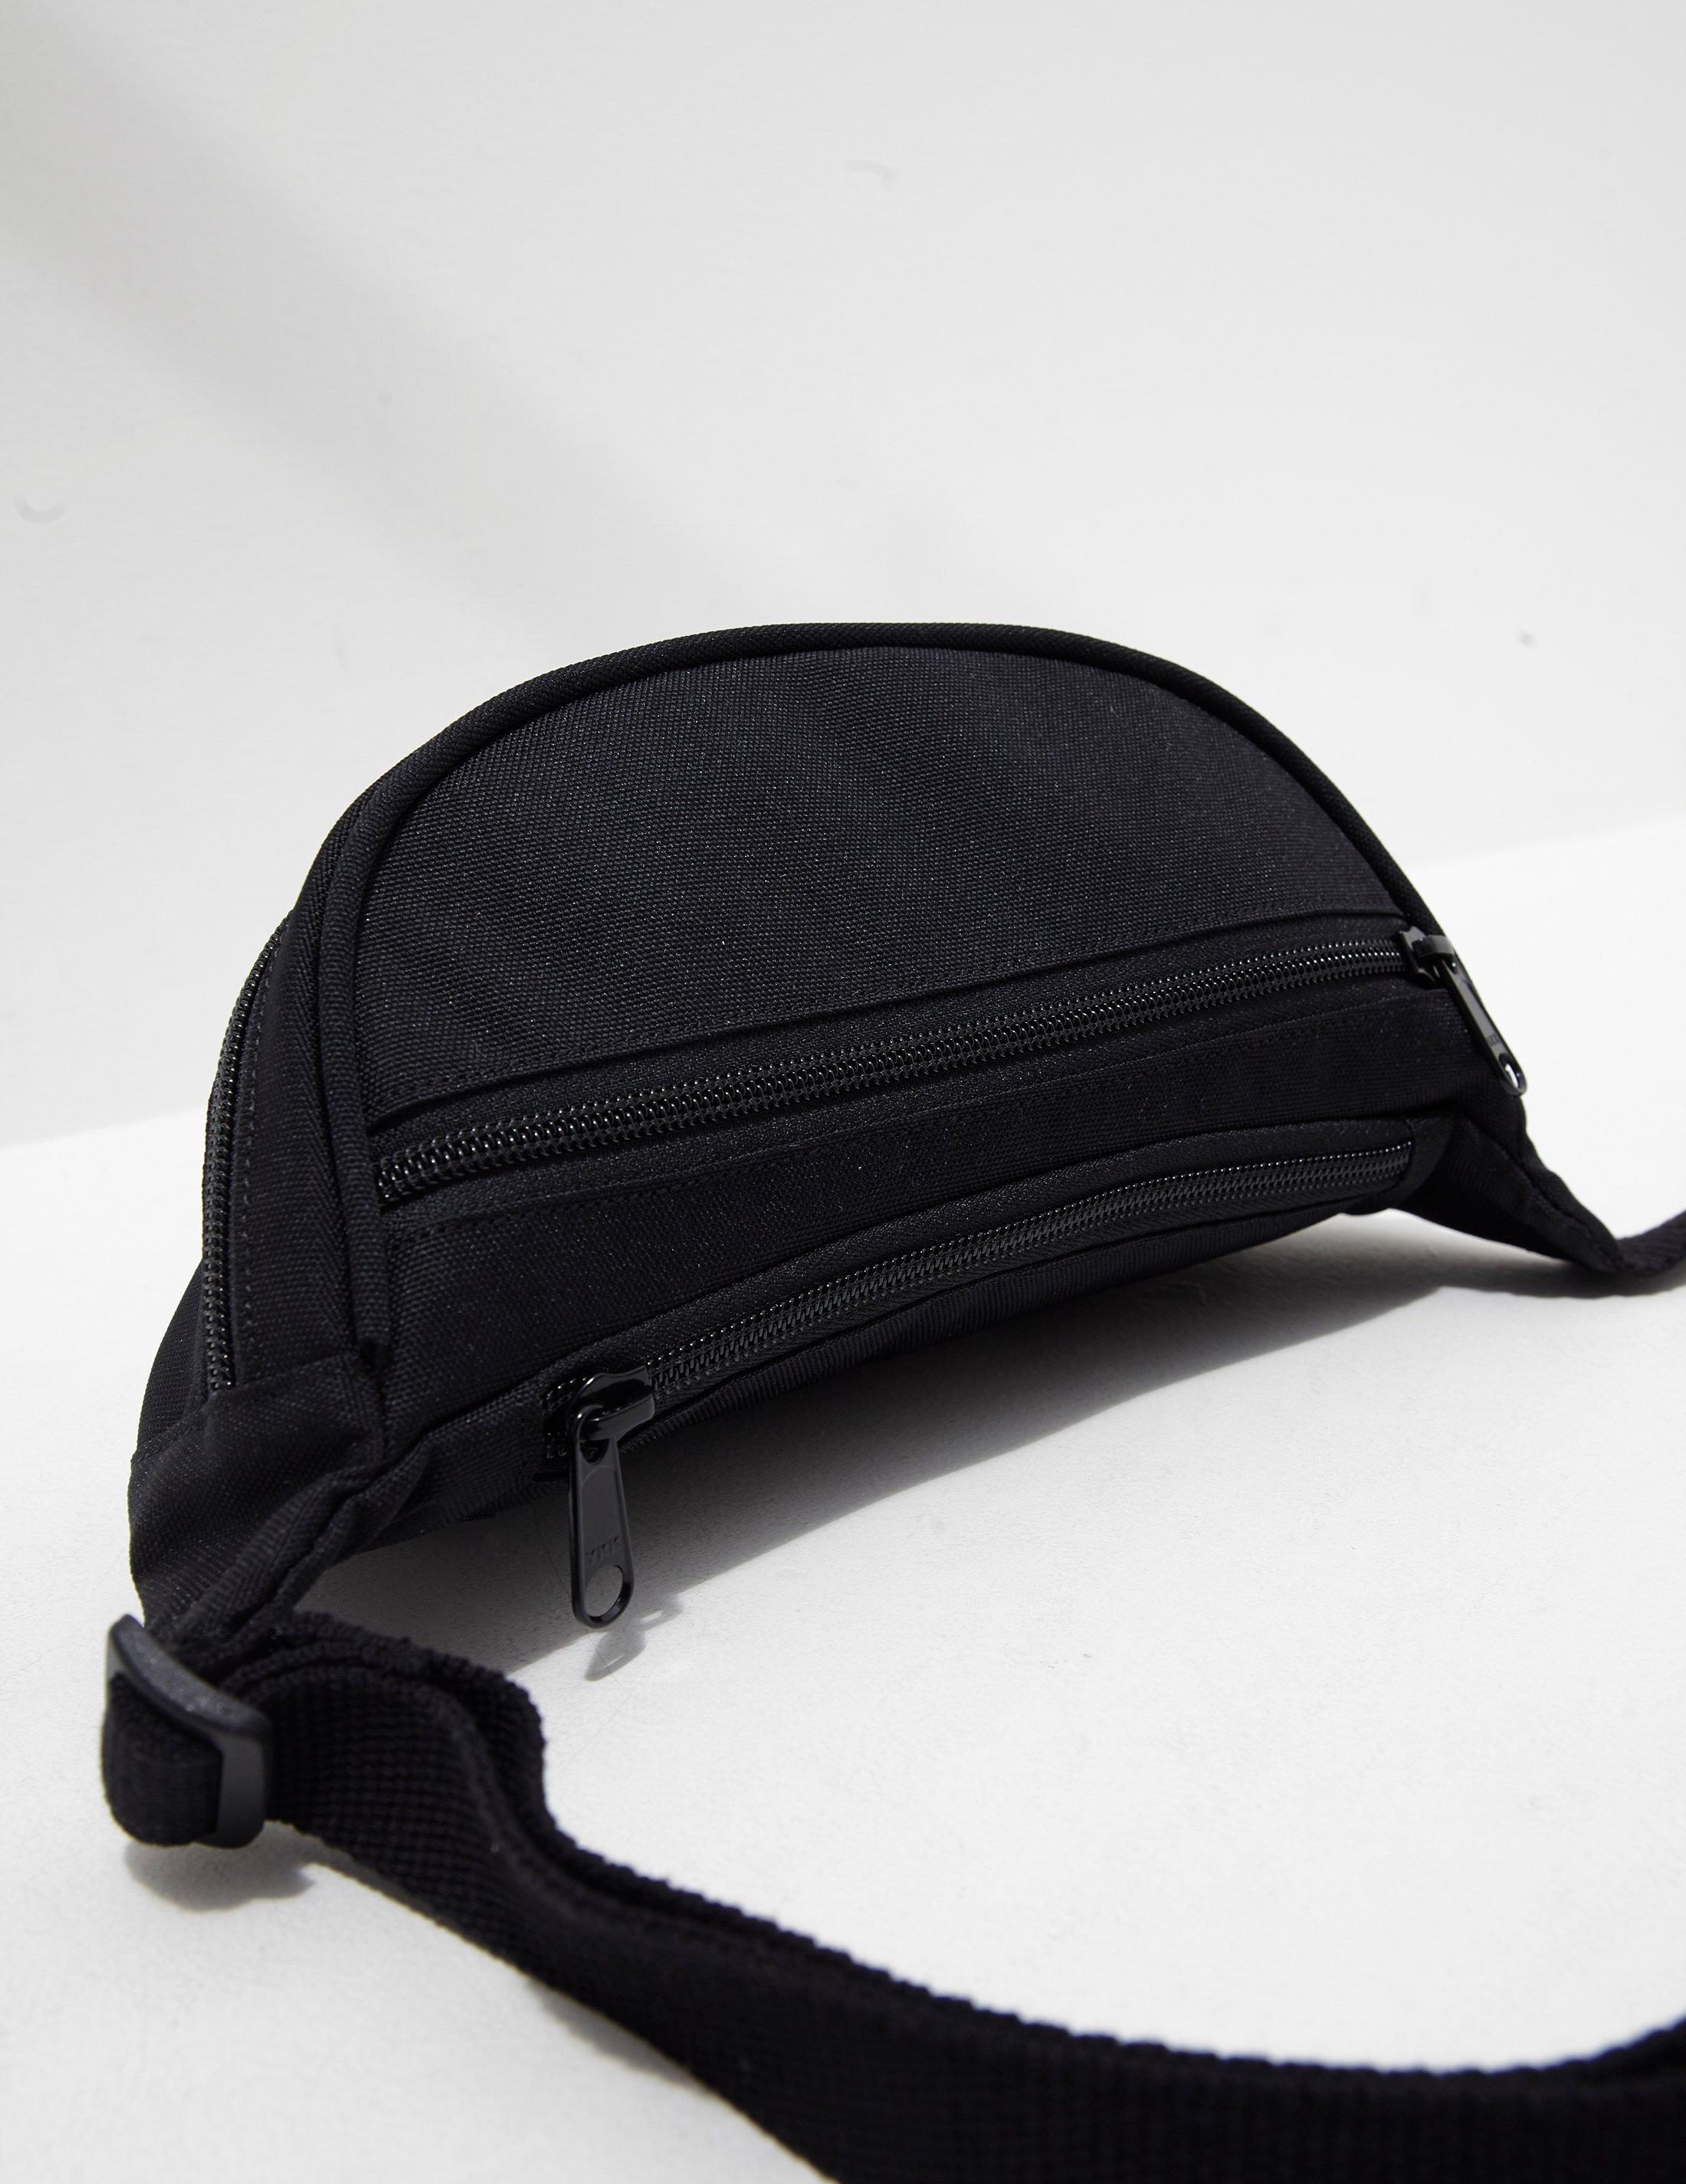 d2c62743d3 Carhartt WIP Mens Watch Hip Bag Black in Black for Men - Lyst